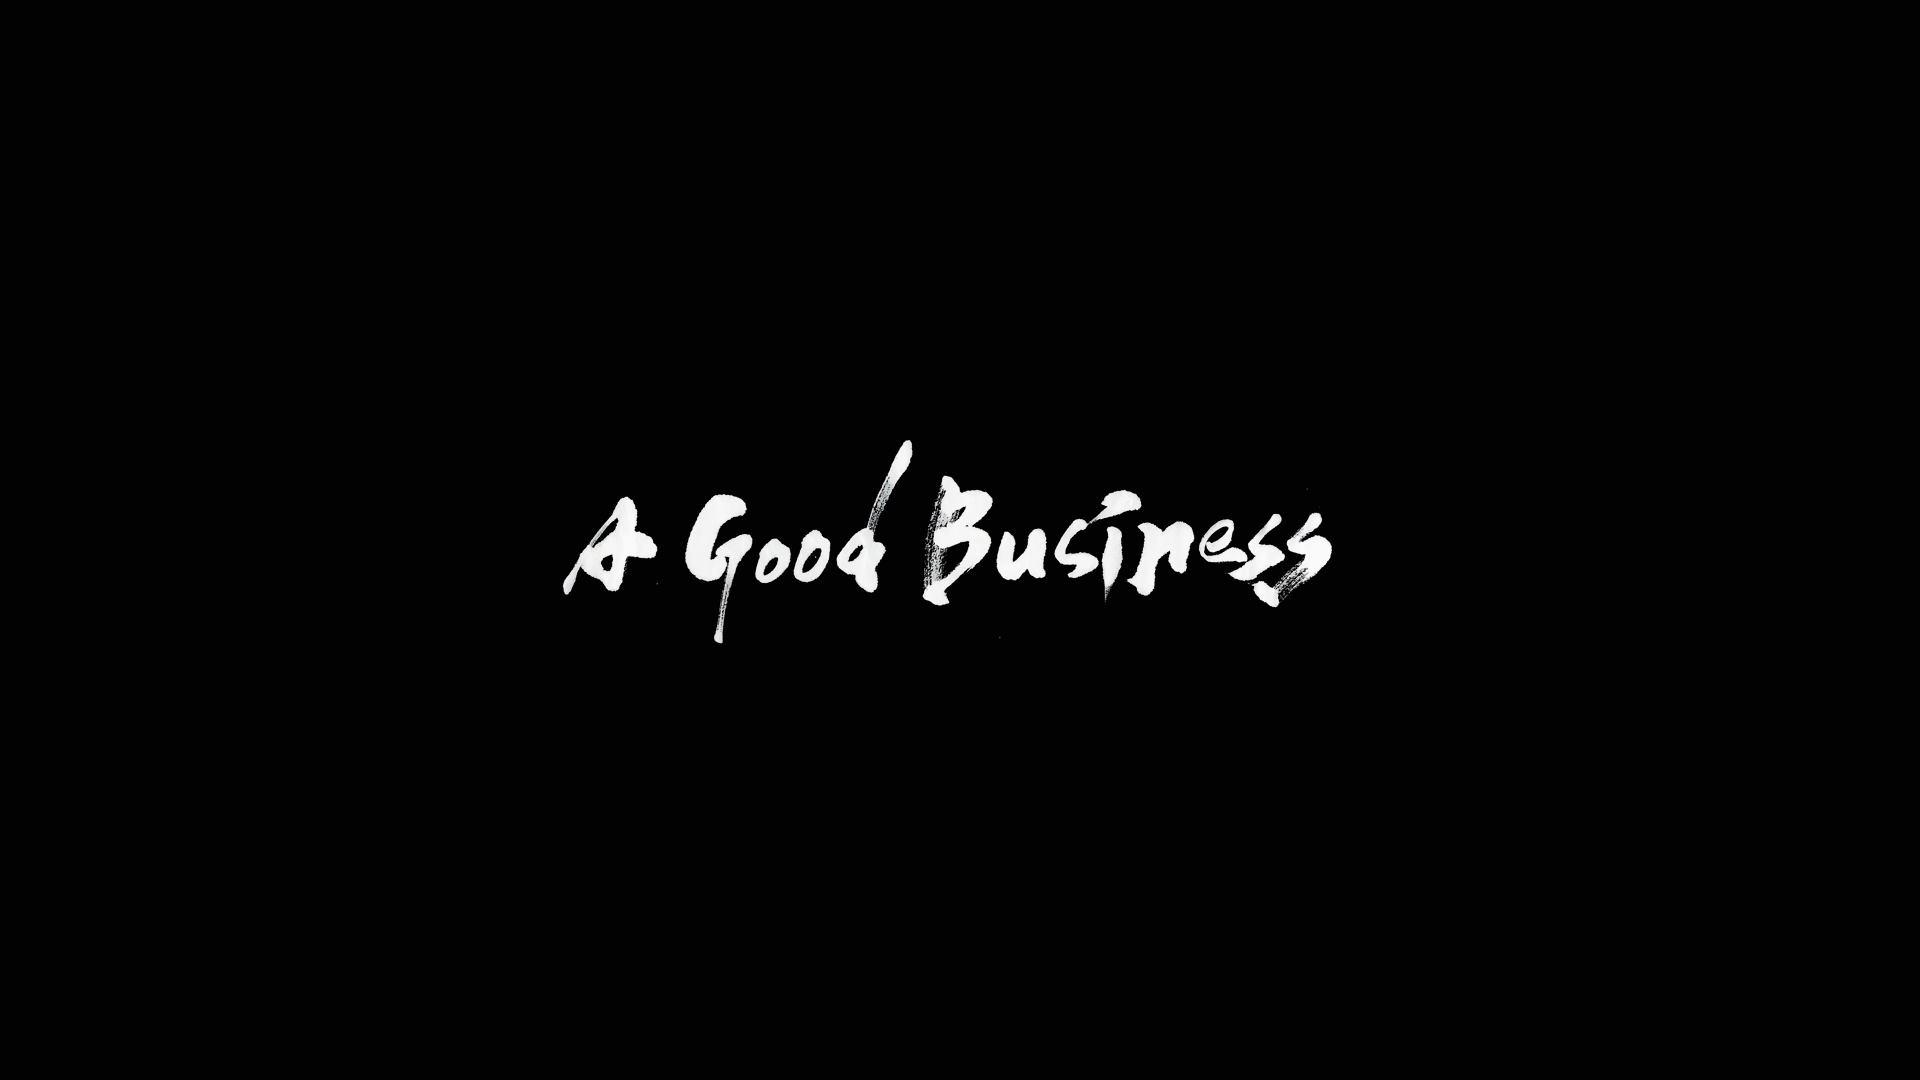 A Good Business_굿 비즈니스 예고